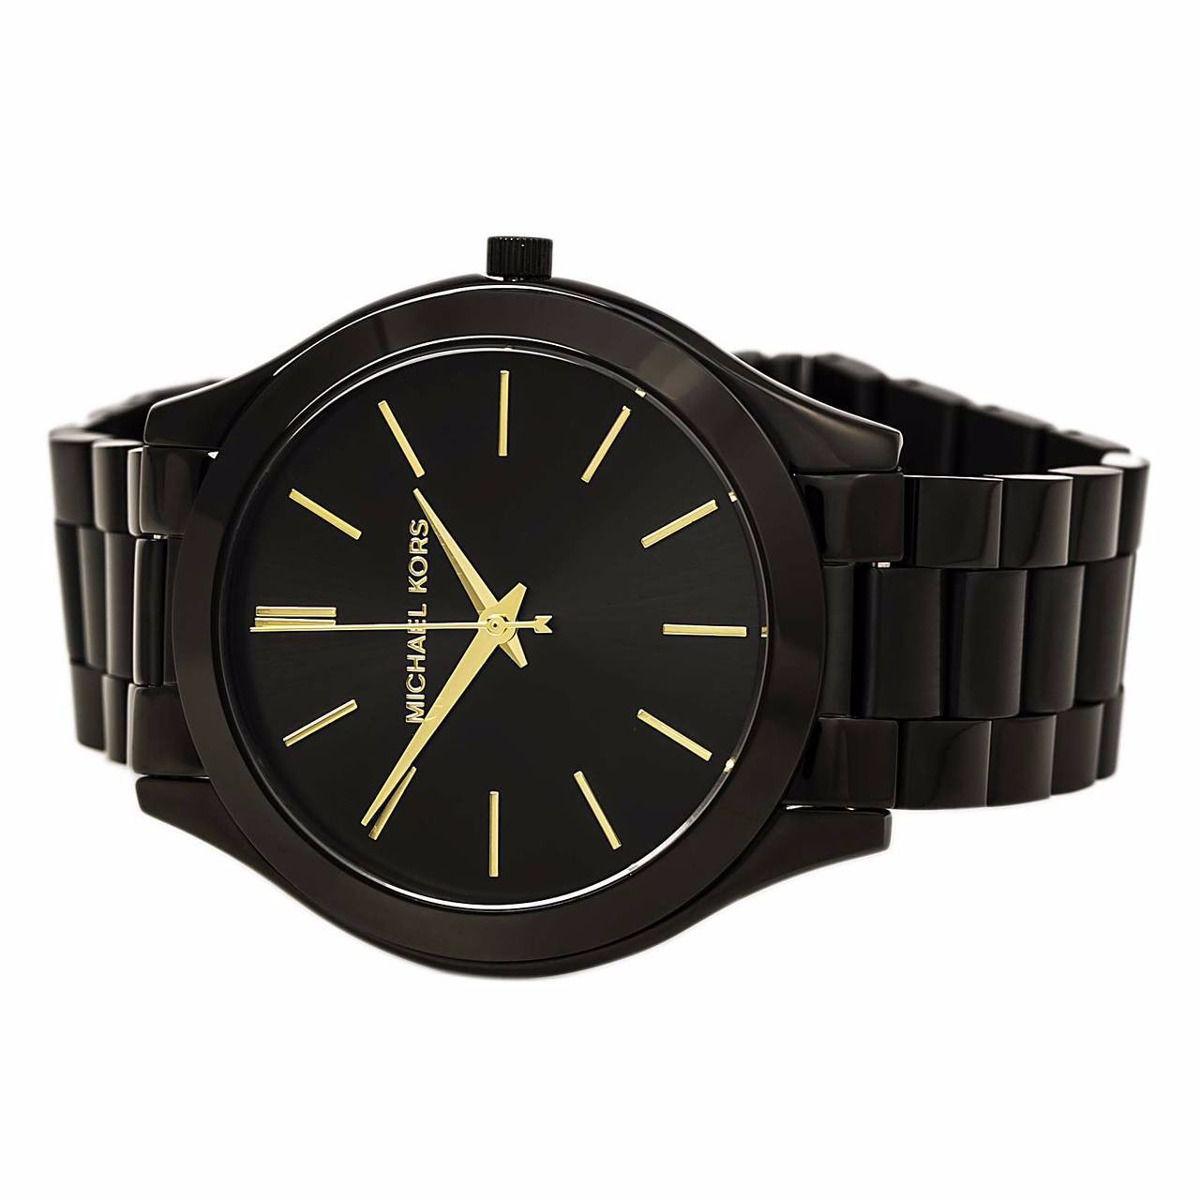 Relógio Michael Kors All StainLess Steel MK 3221